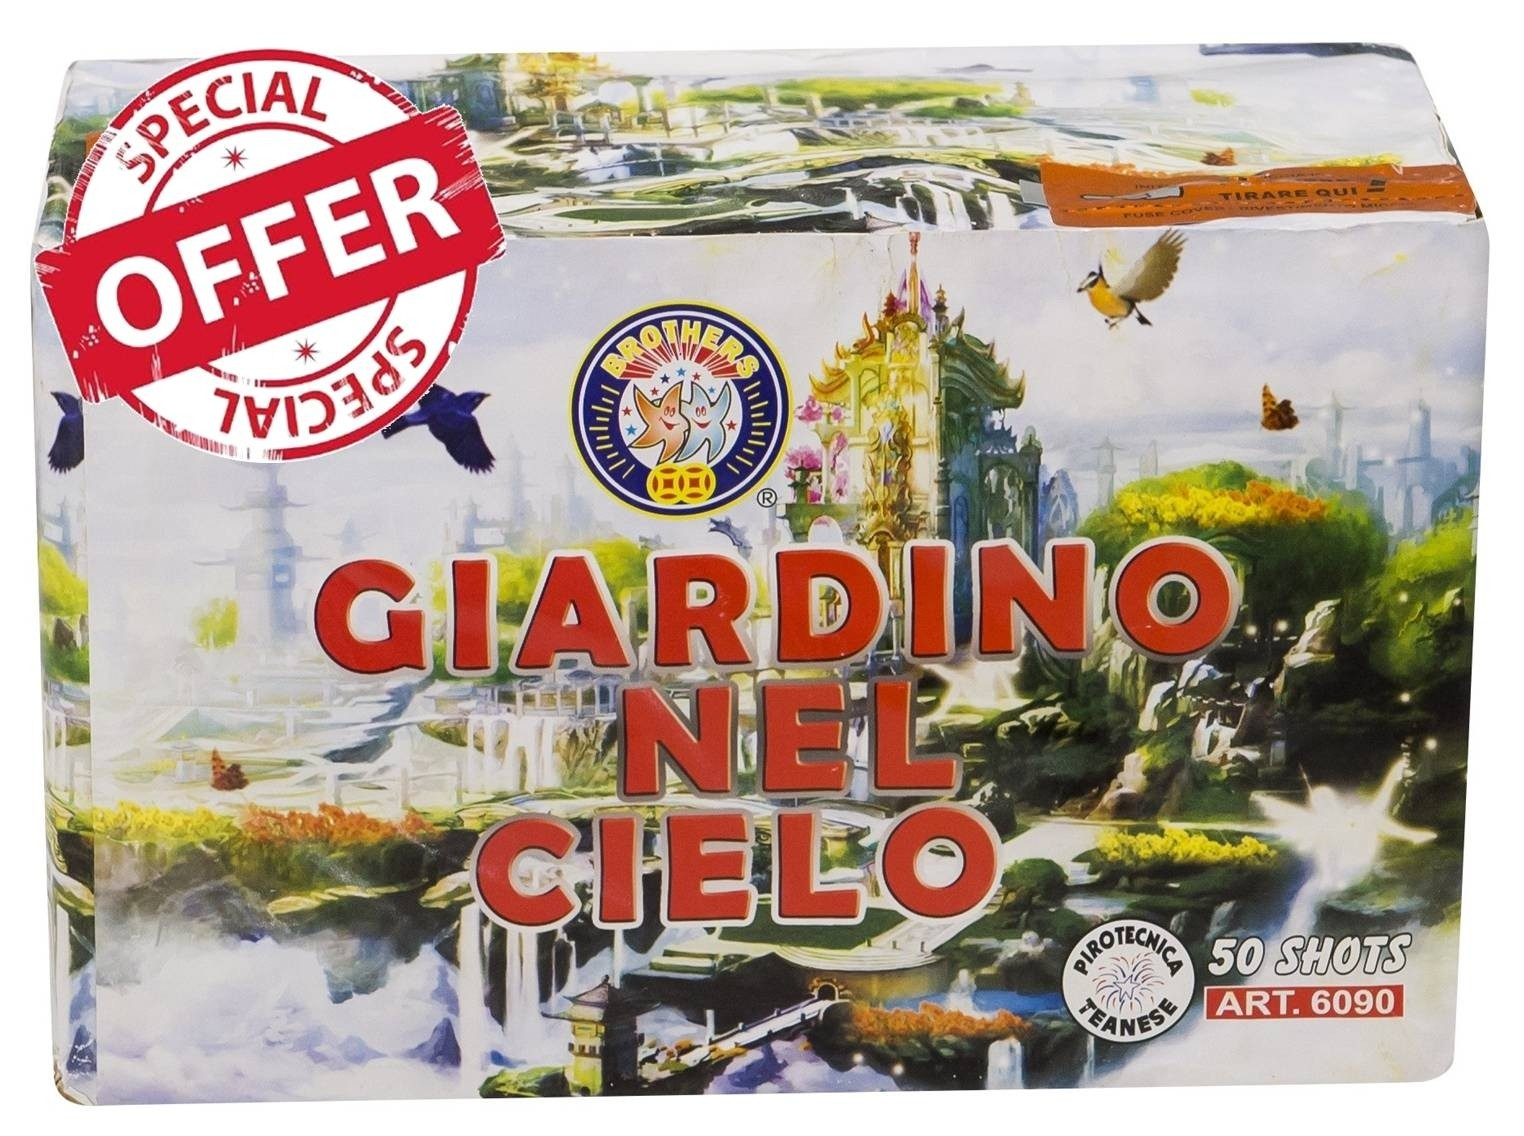 Giardino Nel Cielo (Garden in the Sky) by Brothers Pyrotechnics